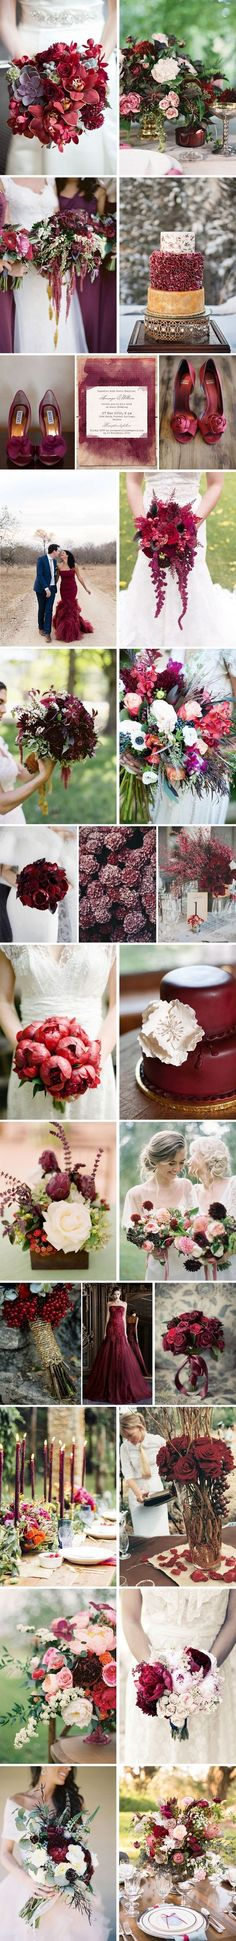 35 {Aubergine and Marsala} Classic Fall Wedding Color Ideas   http://www.deerpearlflowers.com/35-aubergine-marsala-classic-fall-wedding-color-ideas/: